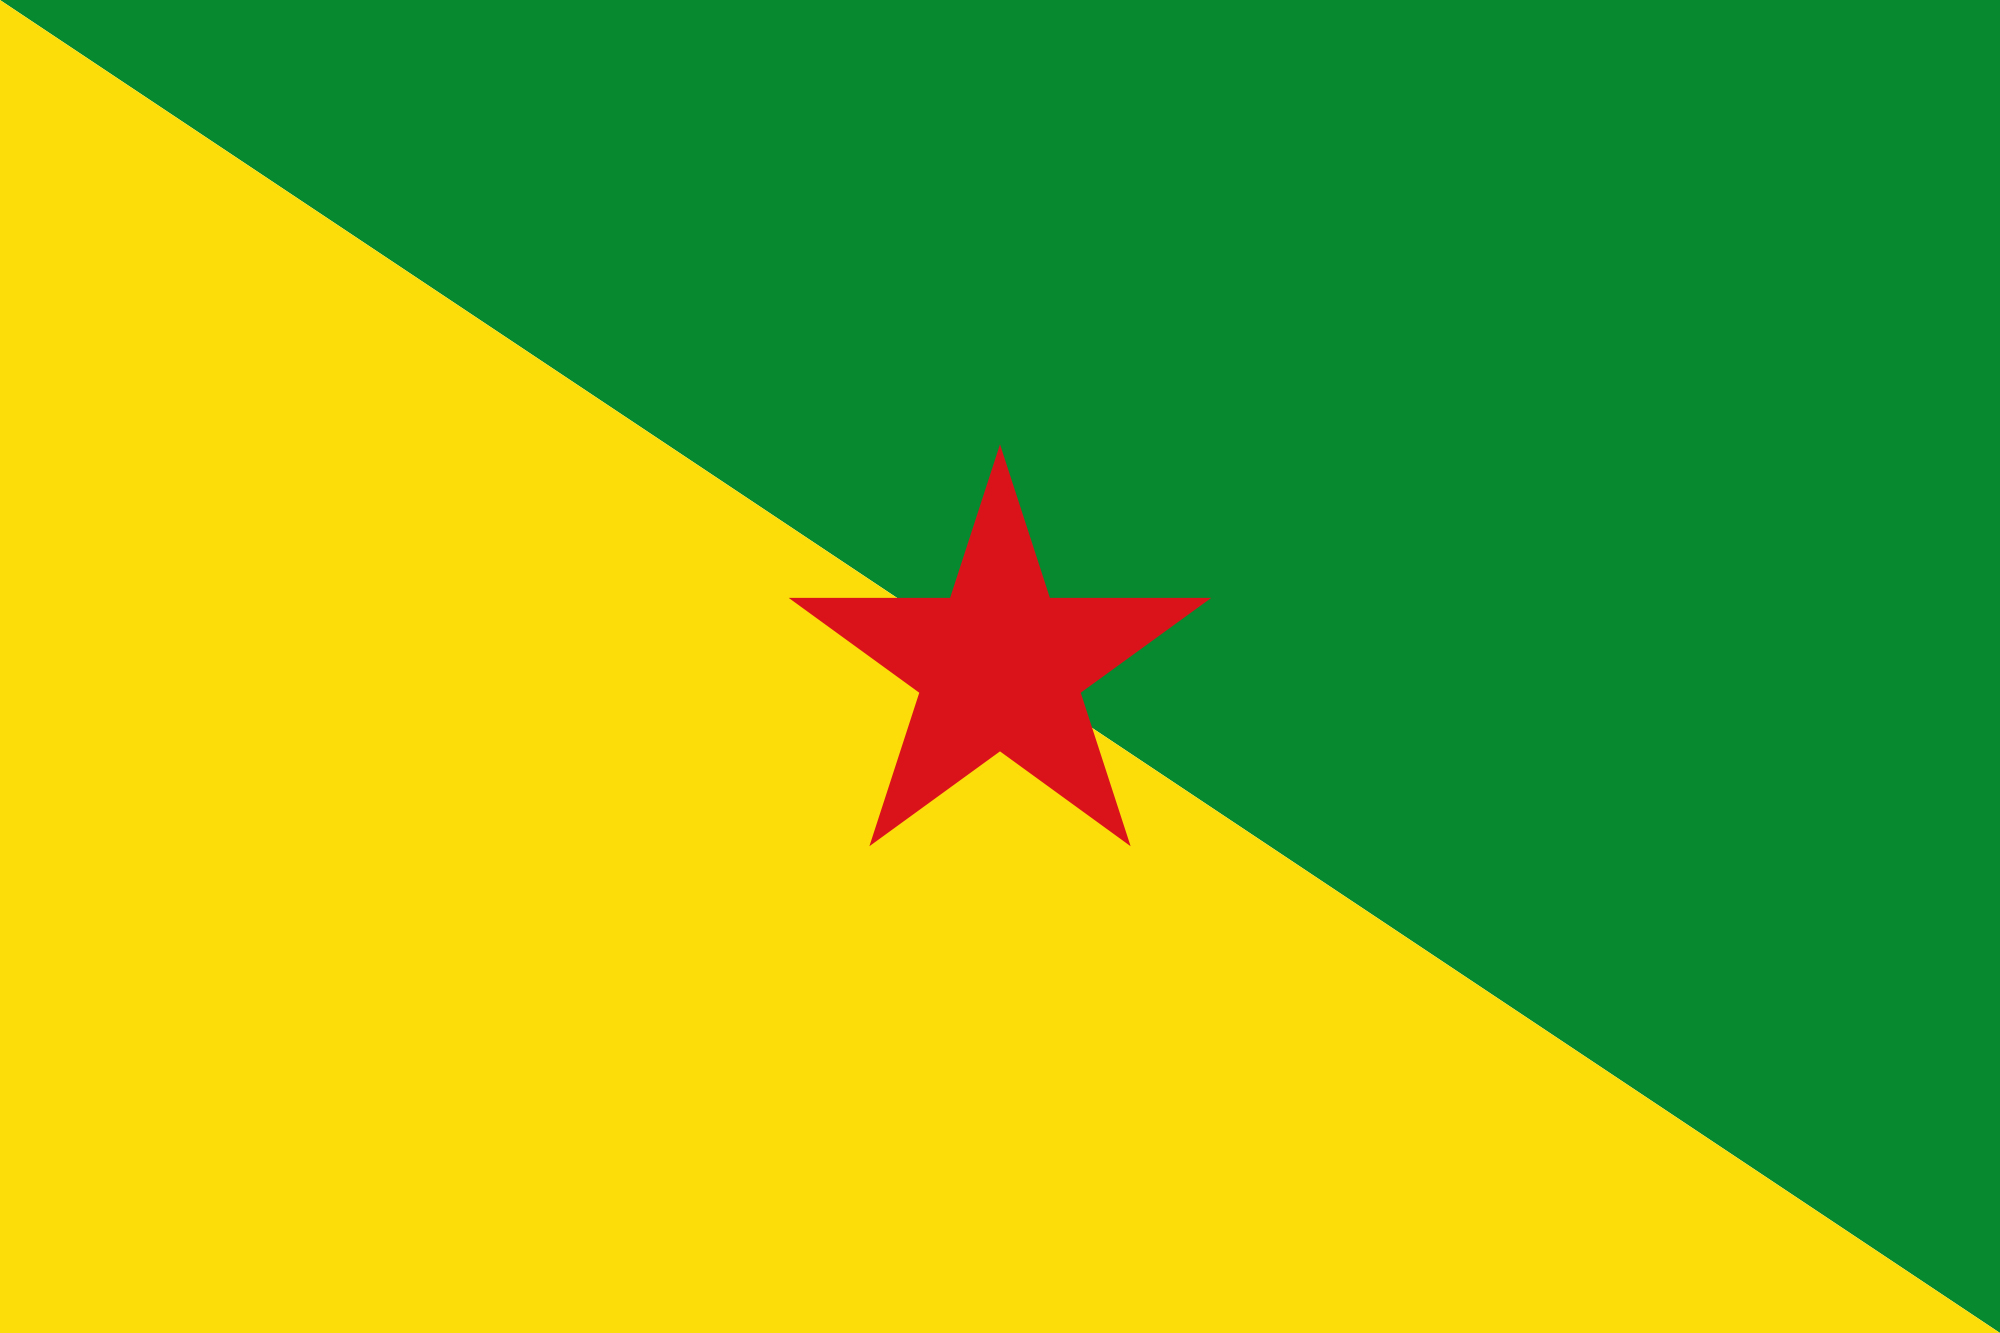 guayana francesa, страна, Эмблема, логотип, символ - Обои HD - Профессор falken.com